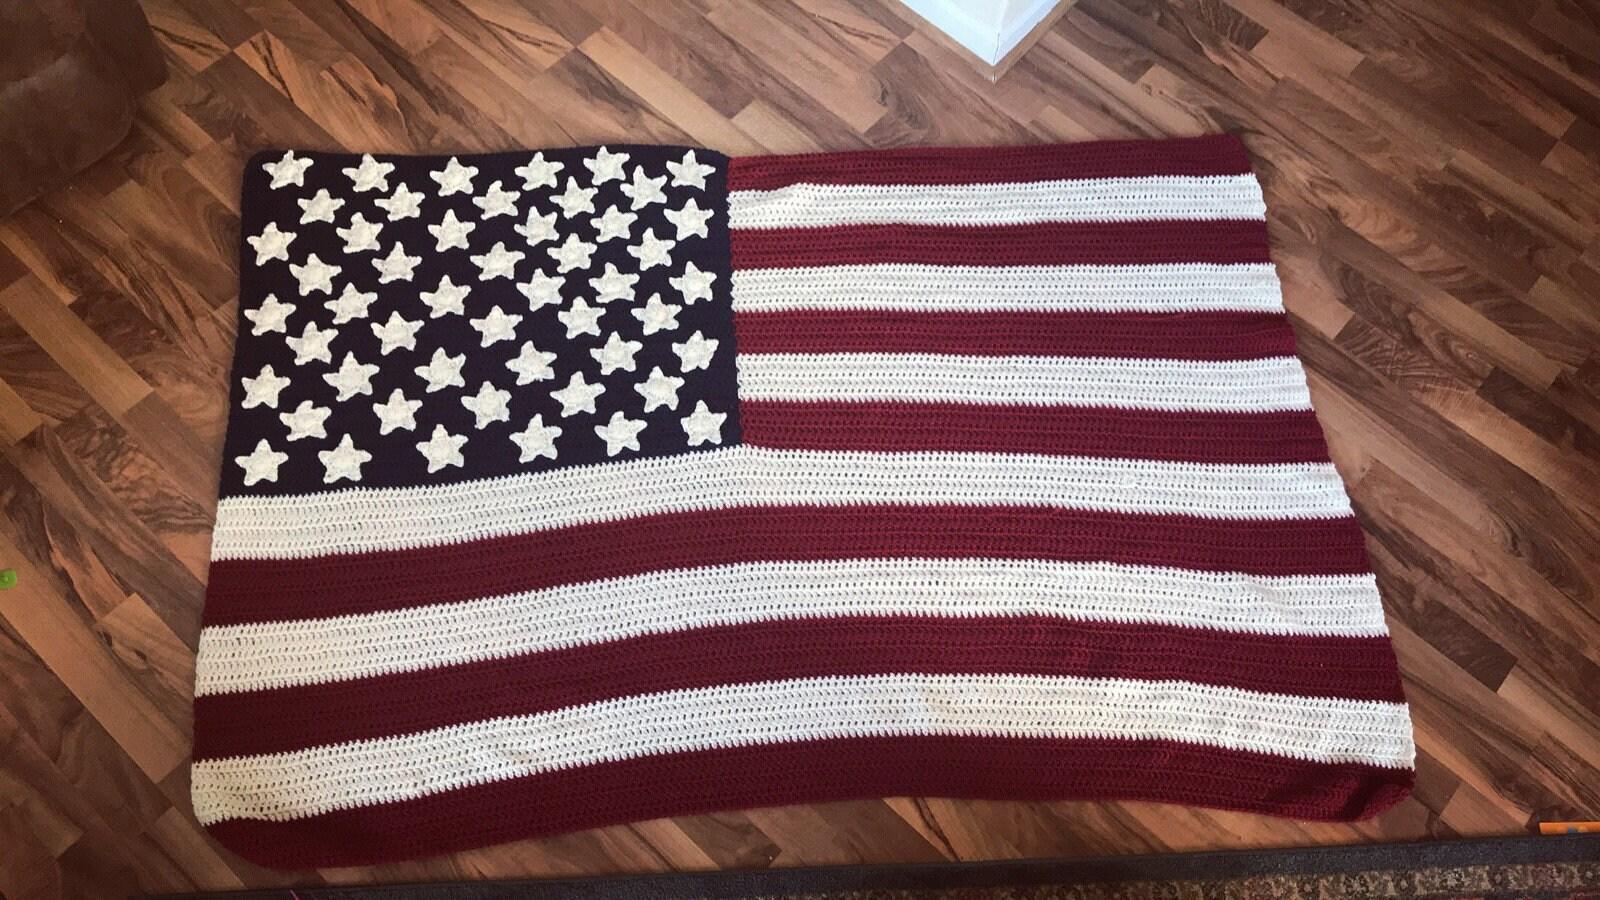 Amazing Amerikanische Flagge Decke Häkelmuster Image Collection ...